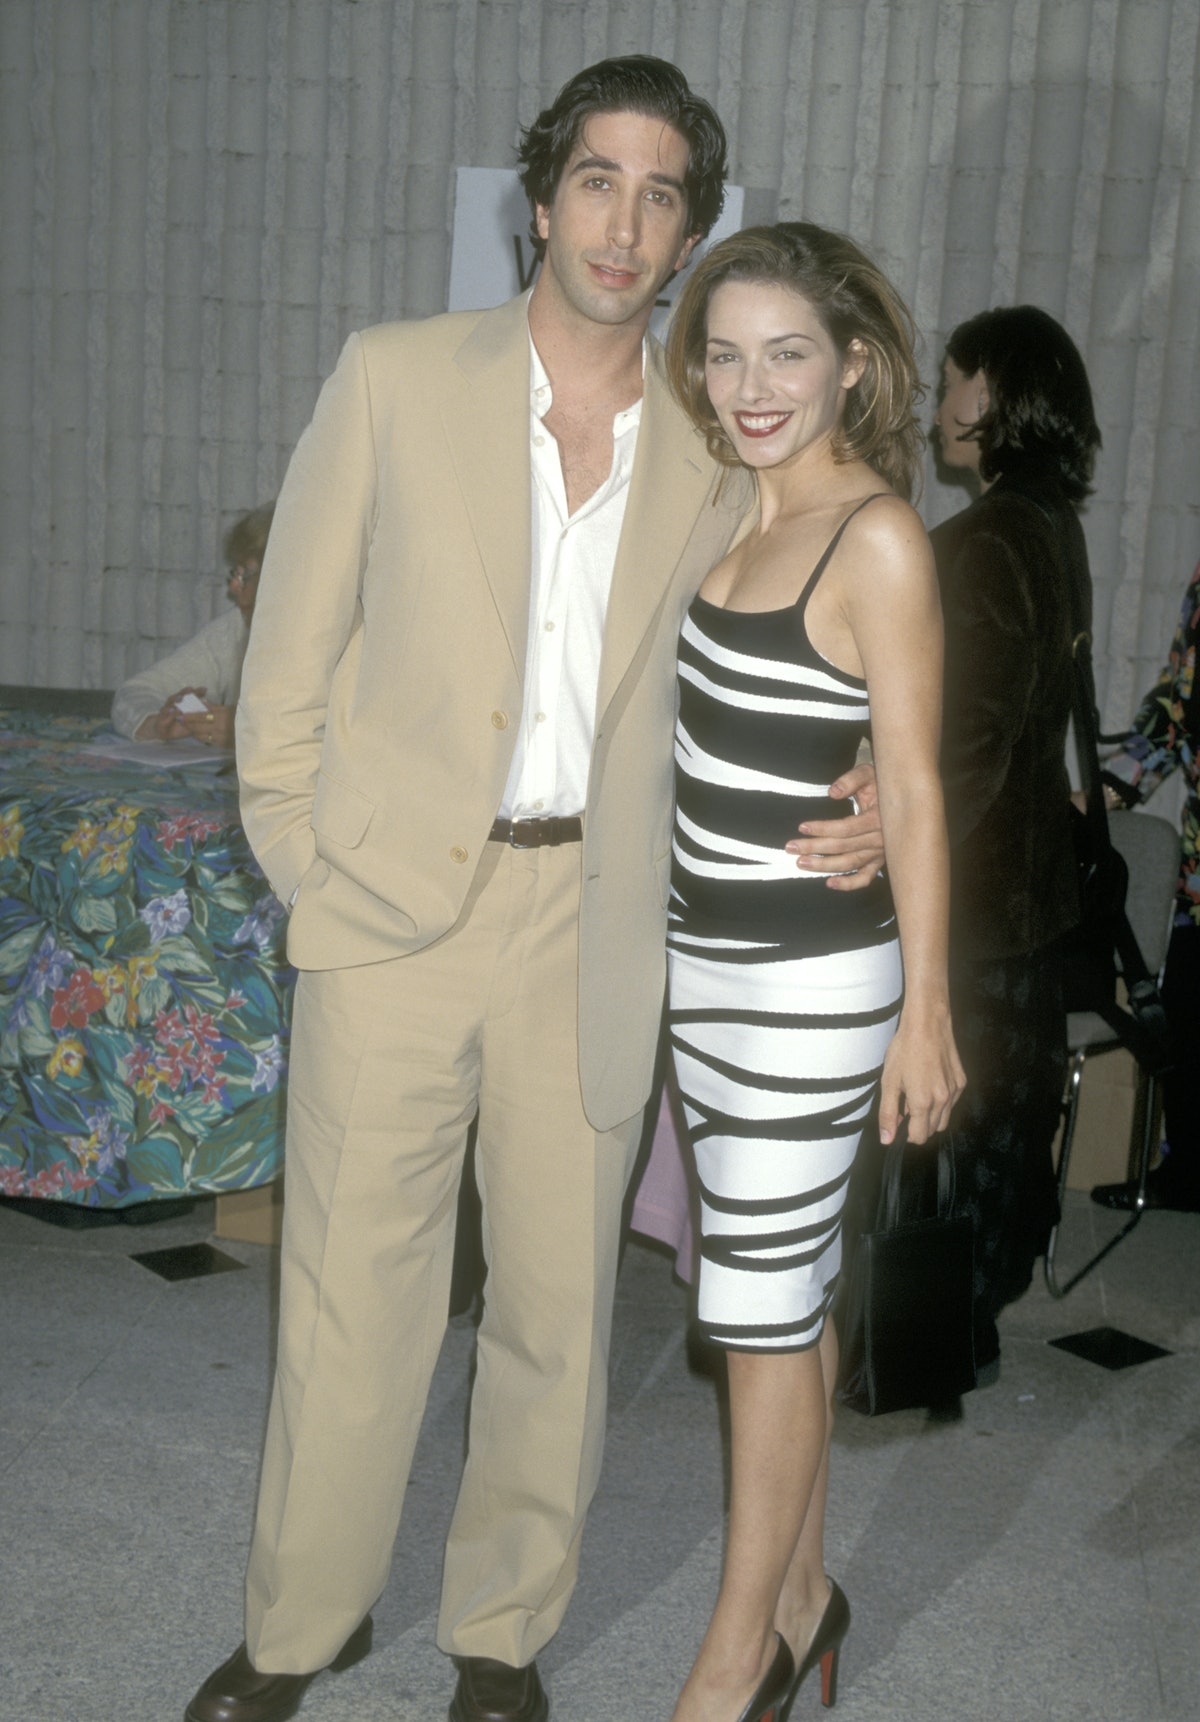 David Schwimmer and Mili Avital dated.